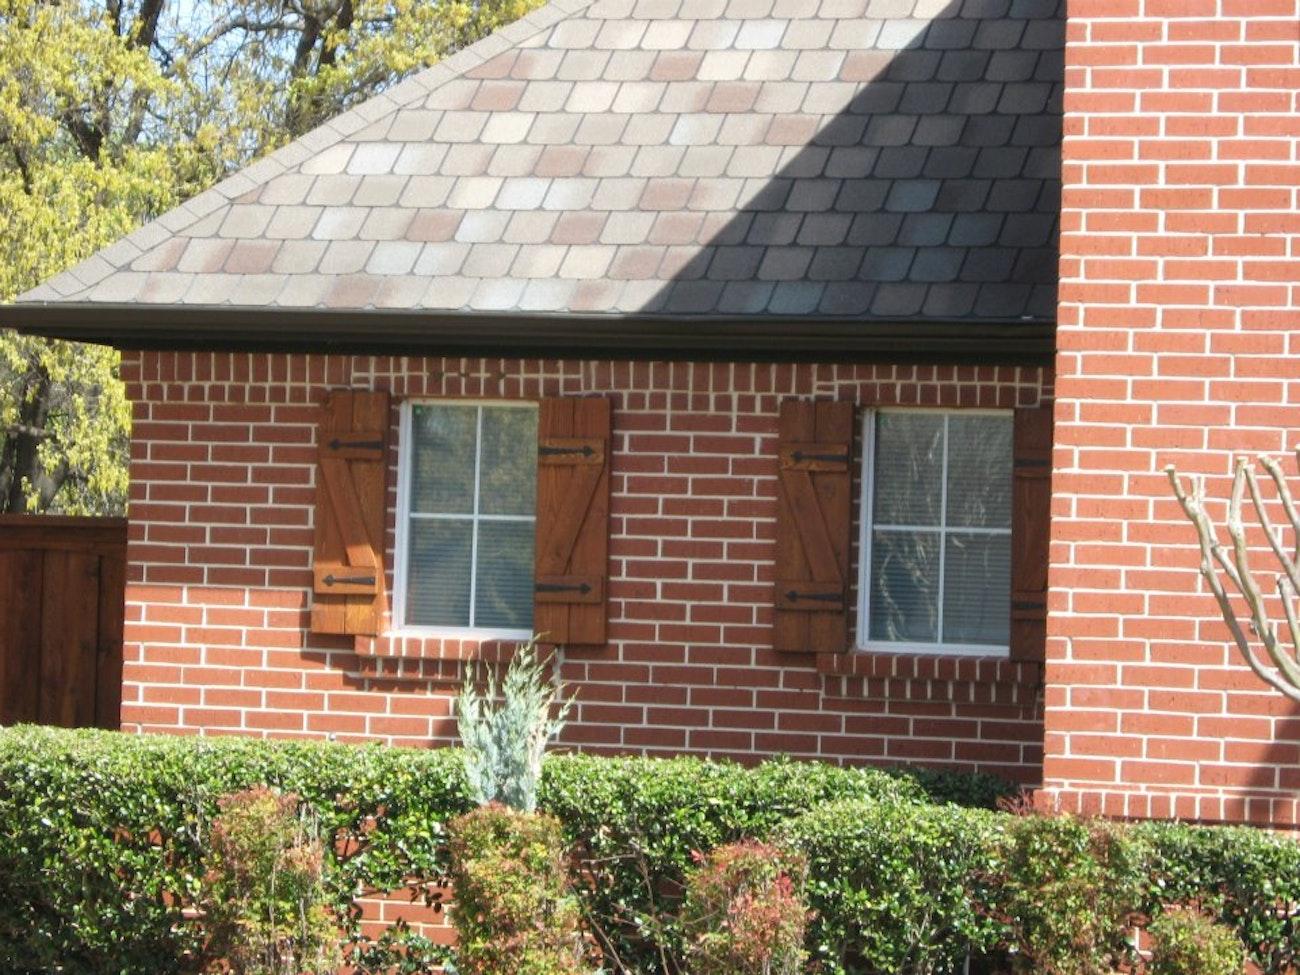 white-builder-grade-aluminum-windows-with-grids